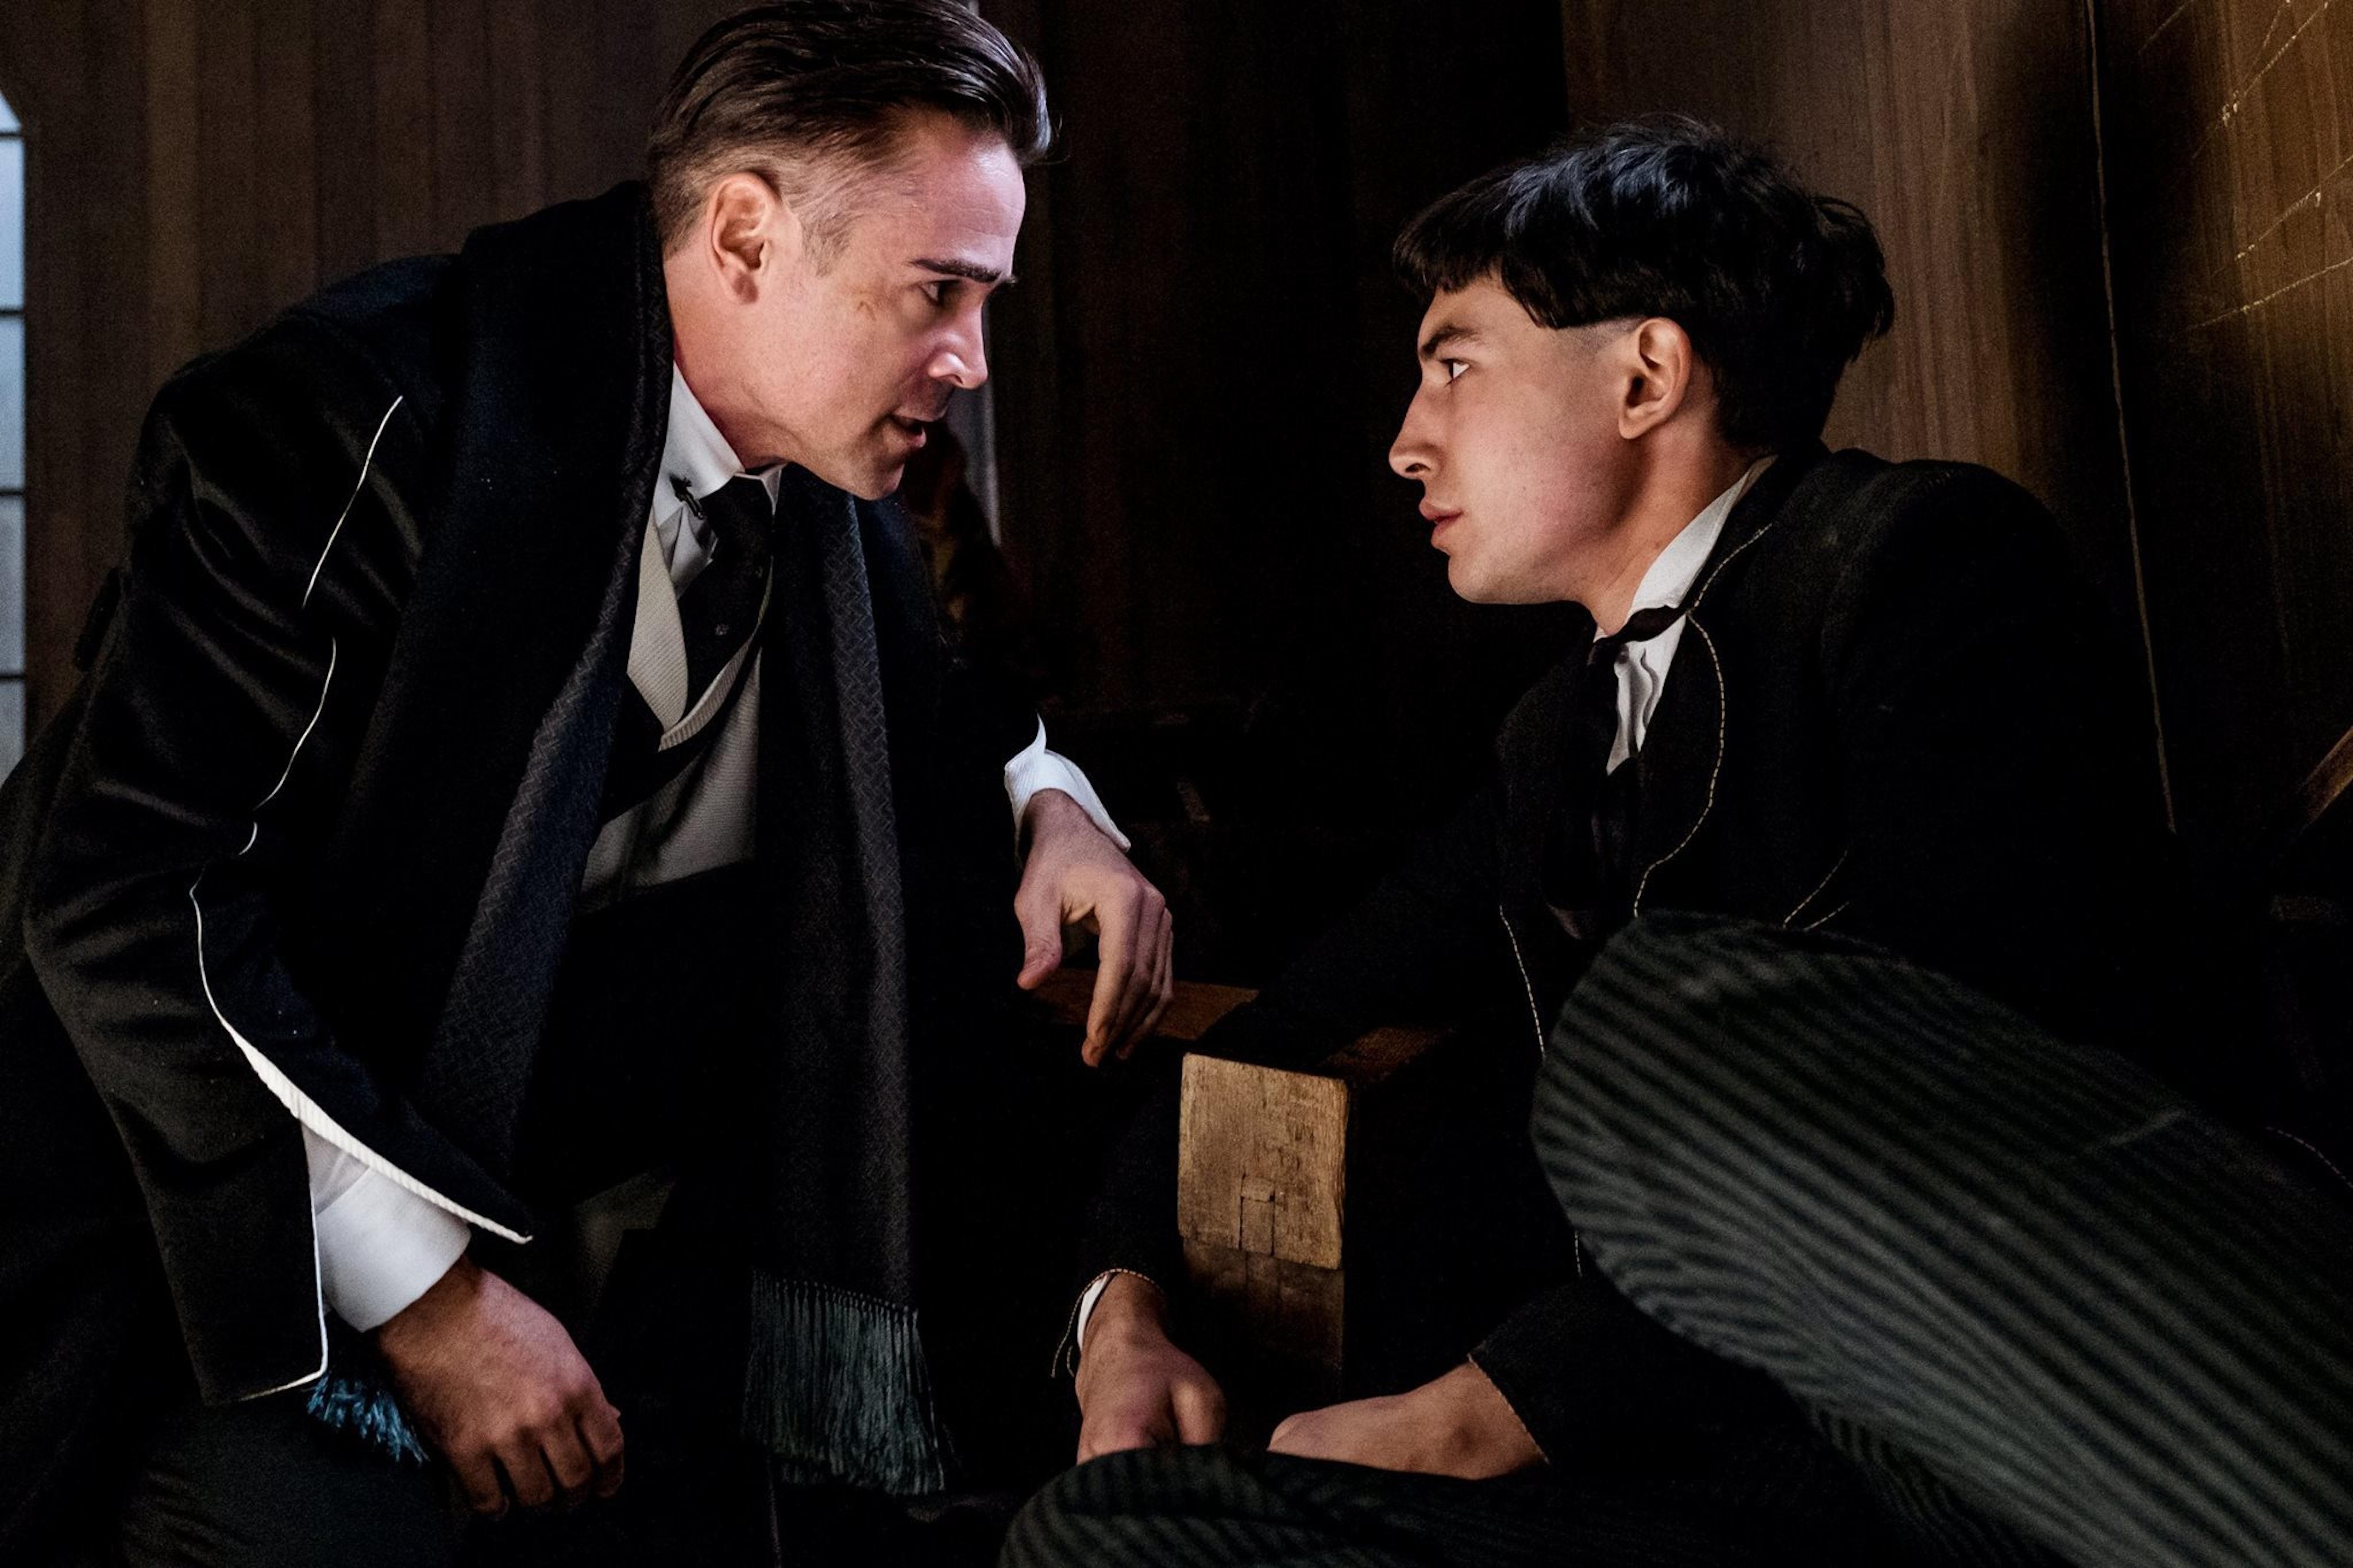 Colin Farrell and Ezra Miller